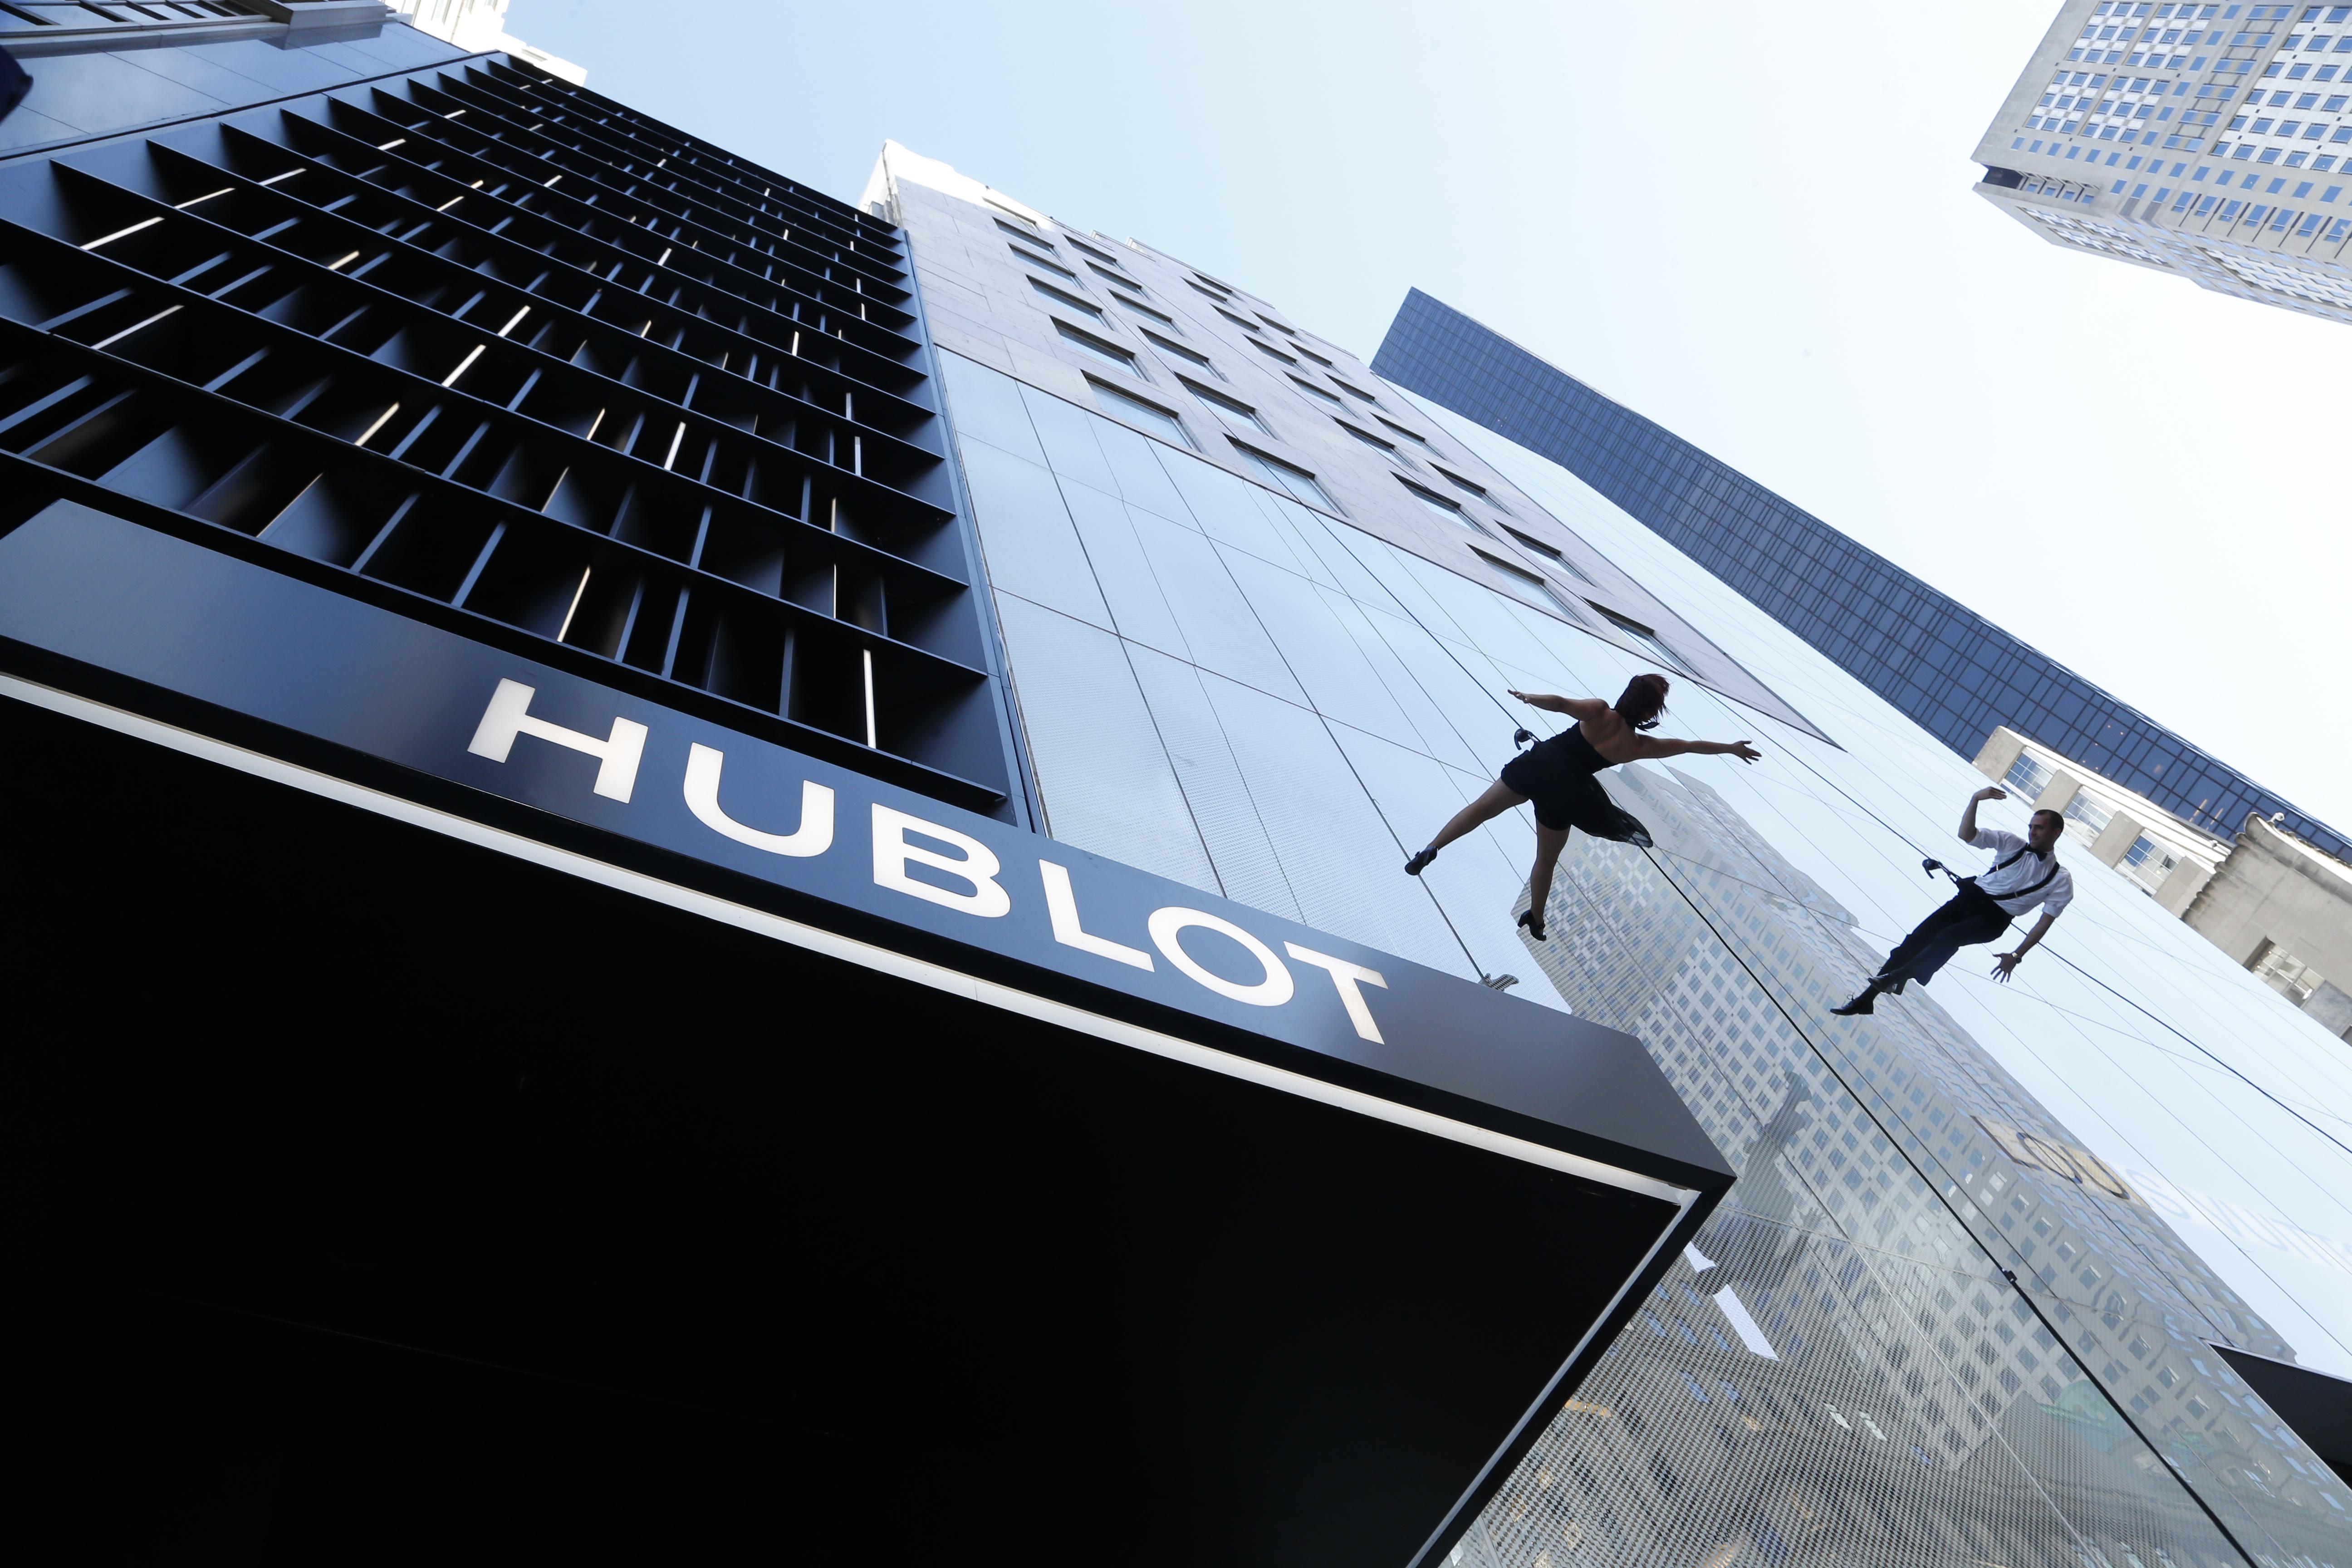 Hublot's Fifth Avenue store.